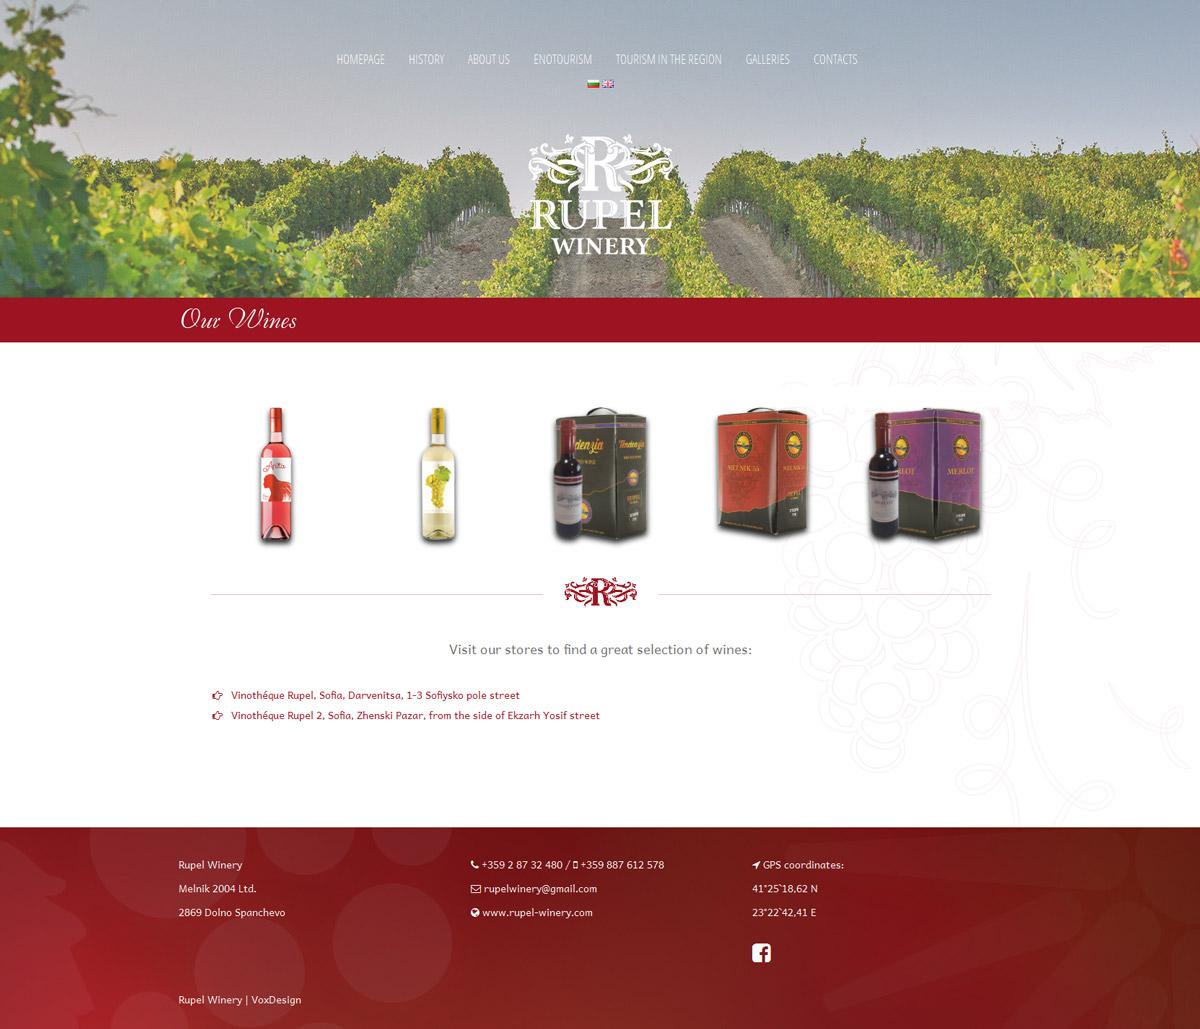 screenshot-rupel-wine-wines-list